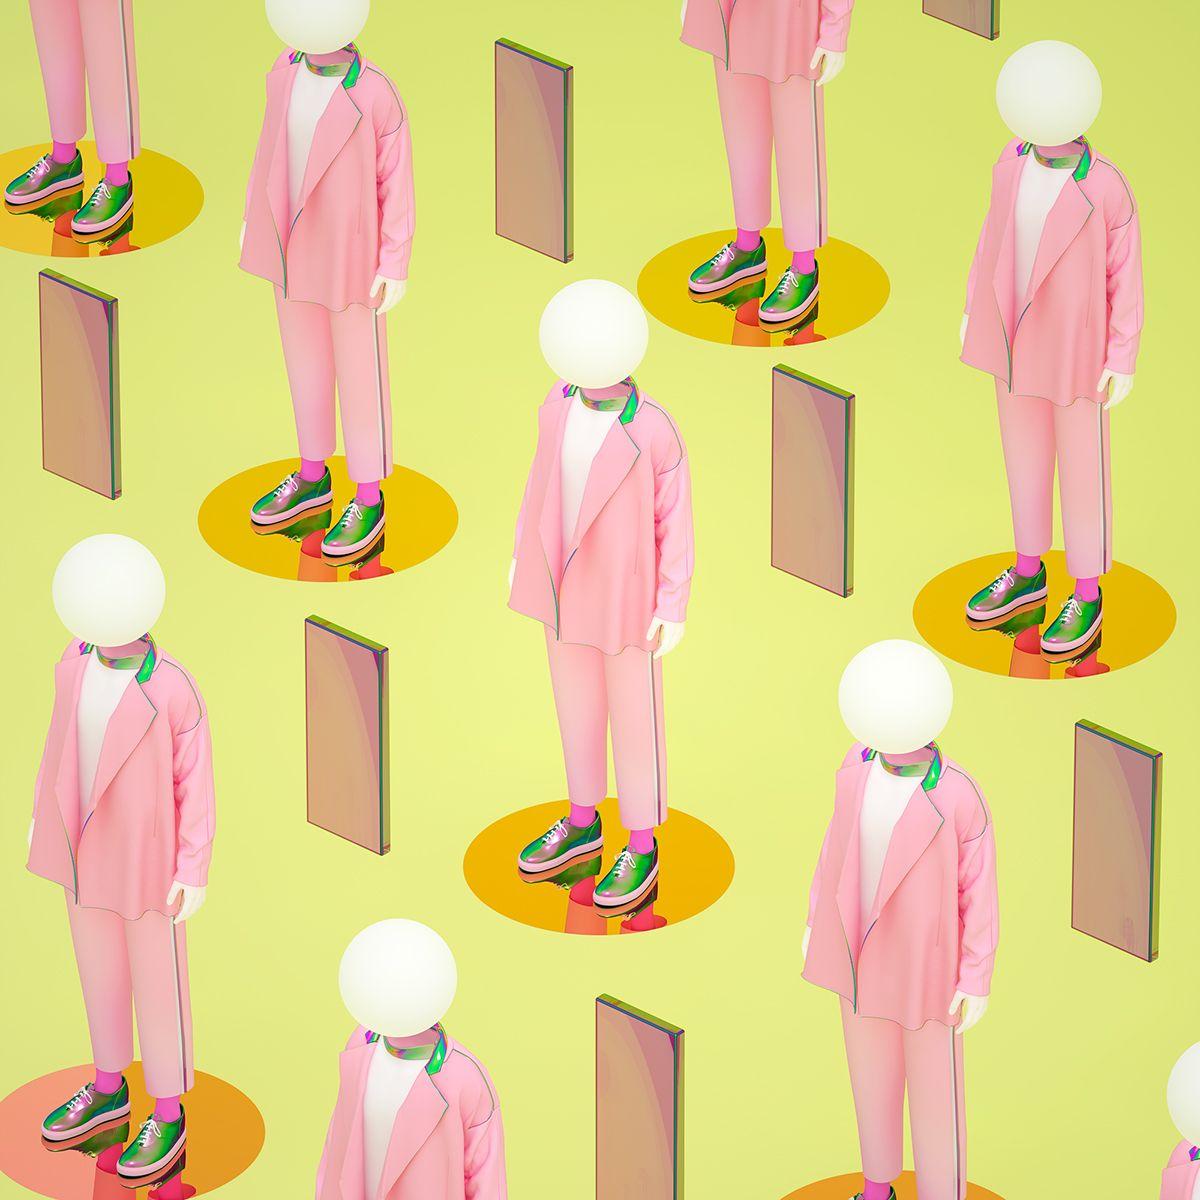 Chinese and Korean-inspired 3D art by Kim Yeonhee